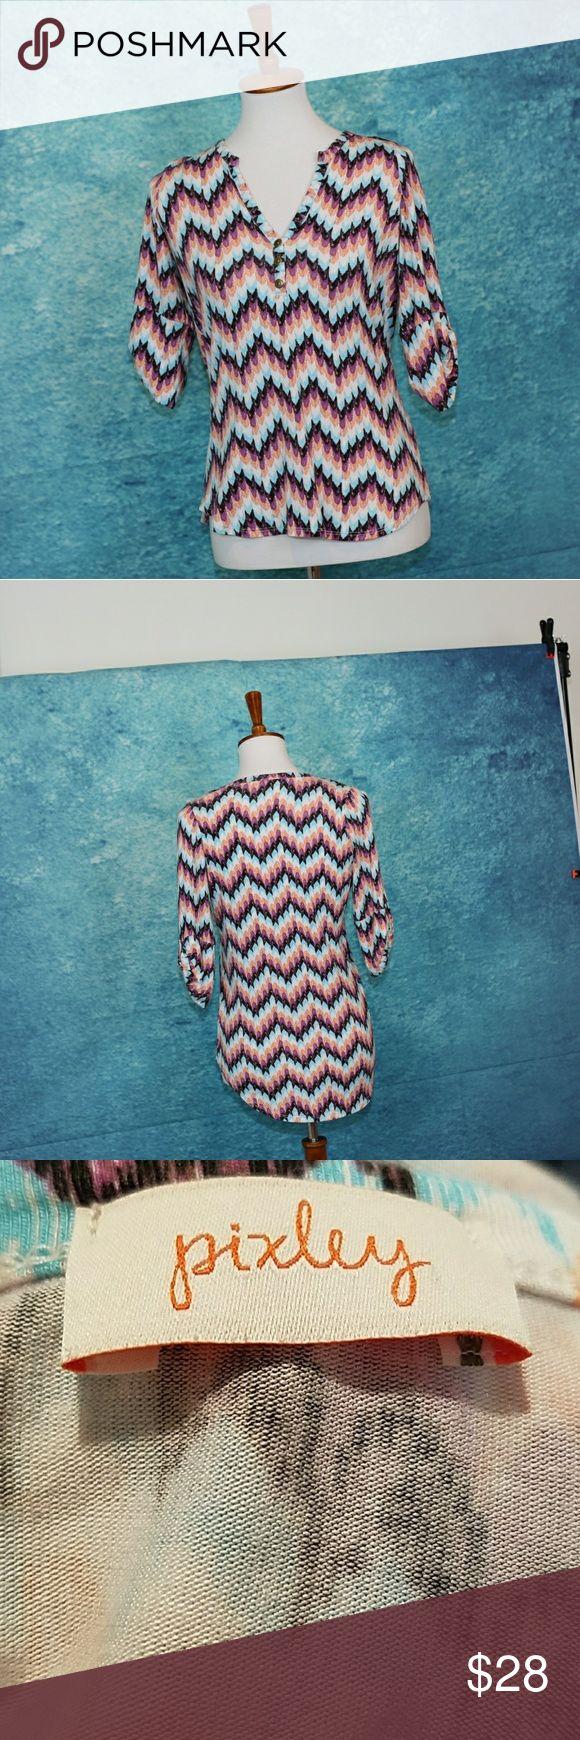 Stitch Fix Pixley chevron blouse. Brass buttons. S Stitch Fix Pixley chevron blouse. Brass buttons, adjustable button sleeves, soft fabric. Orange, black, white, blue, purple. S. Excellent condition. Pixley Tops Blouses